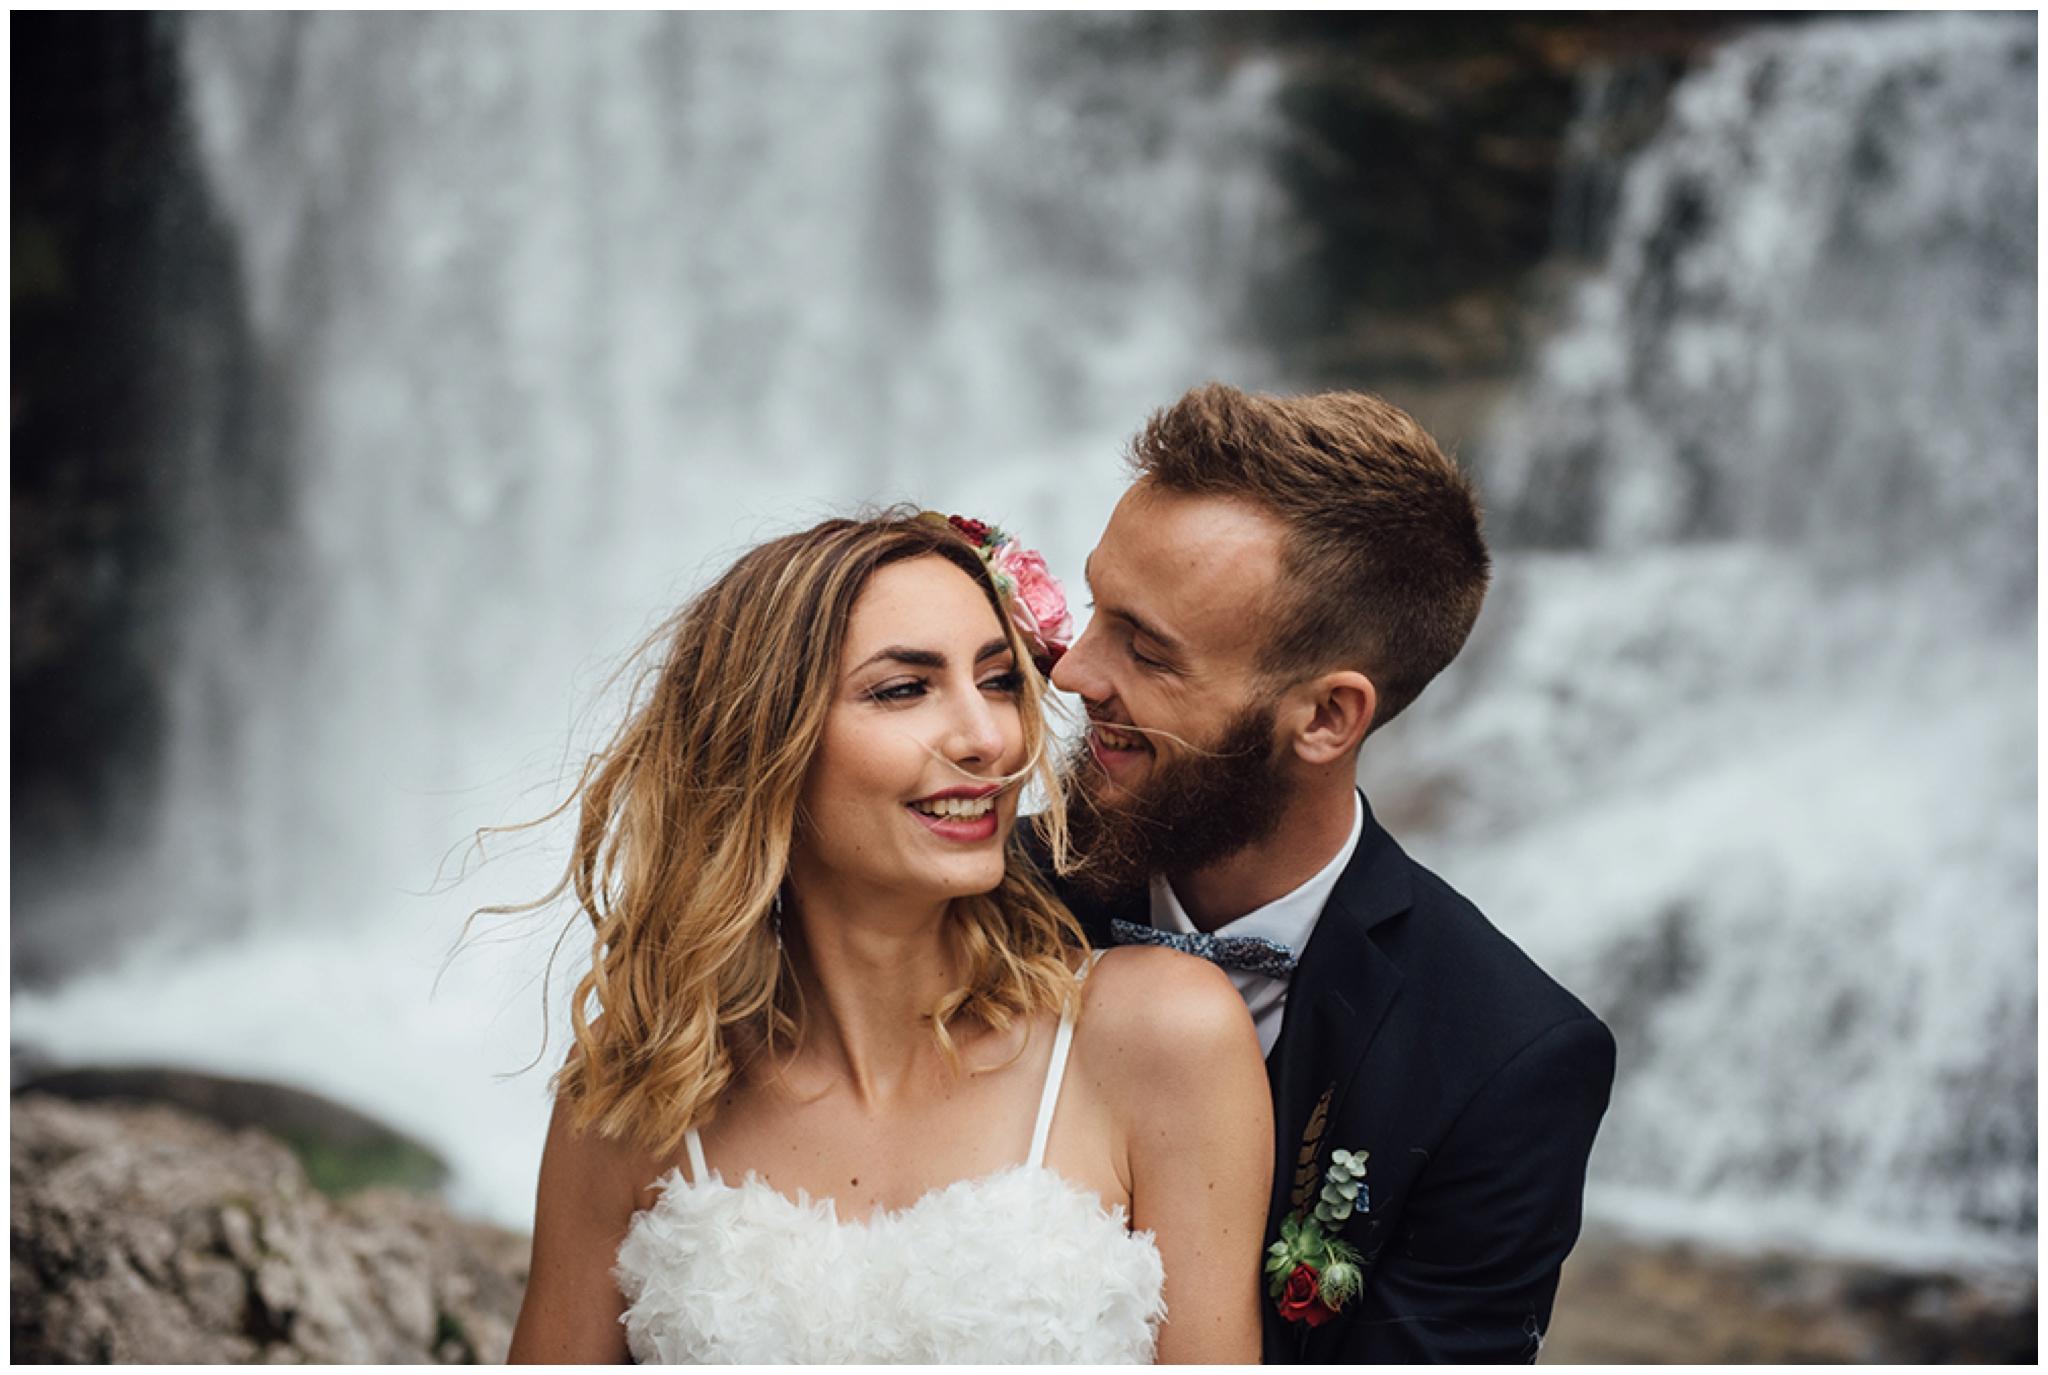 photographe-mariage-grenoble-annecy-lyon-shooting-inspiration-boheme-037